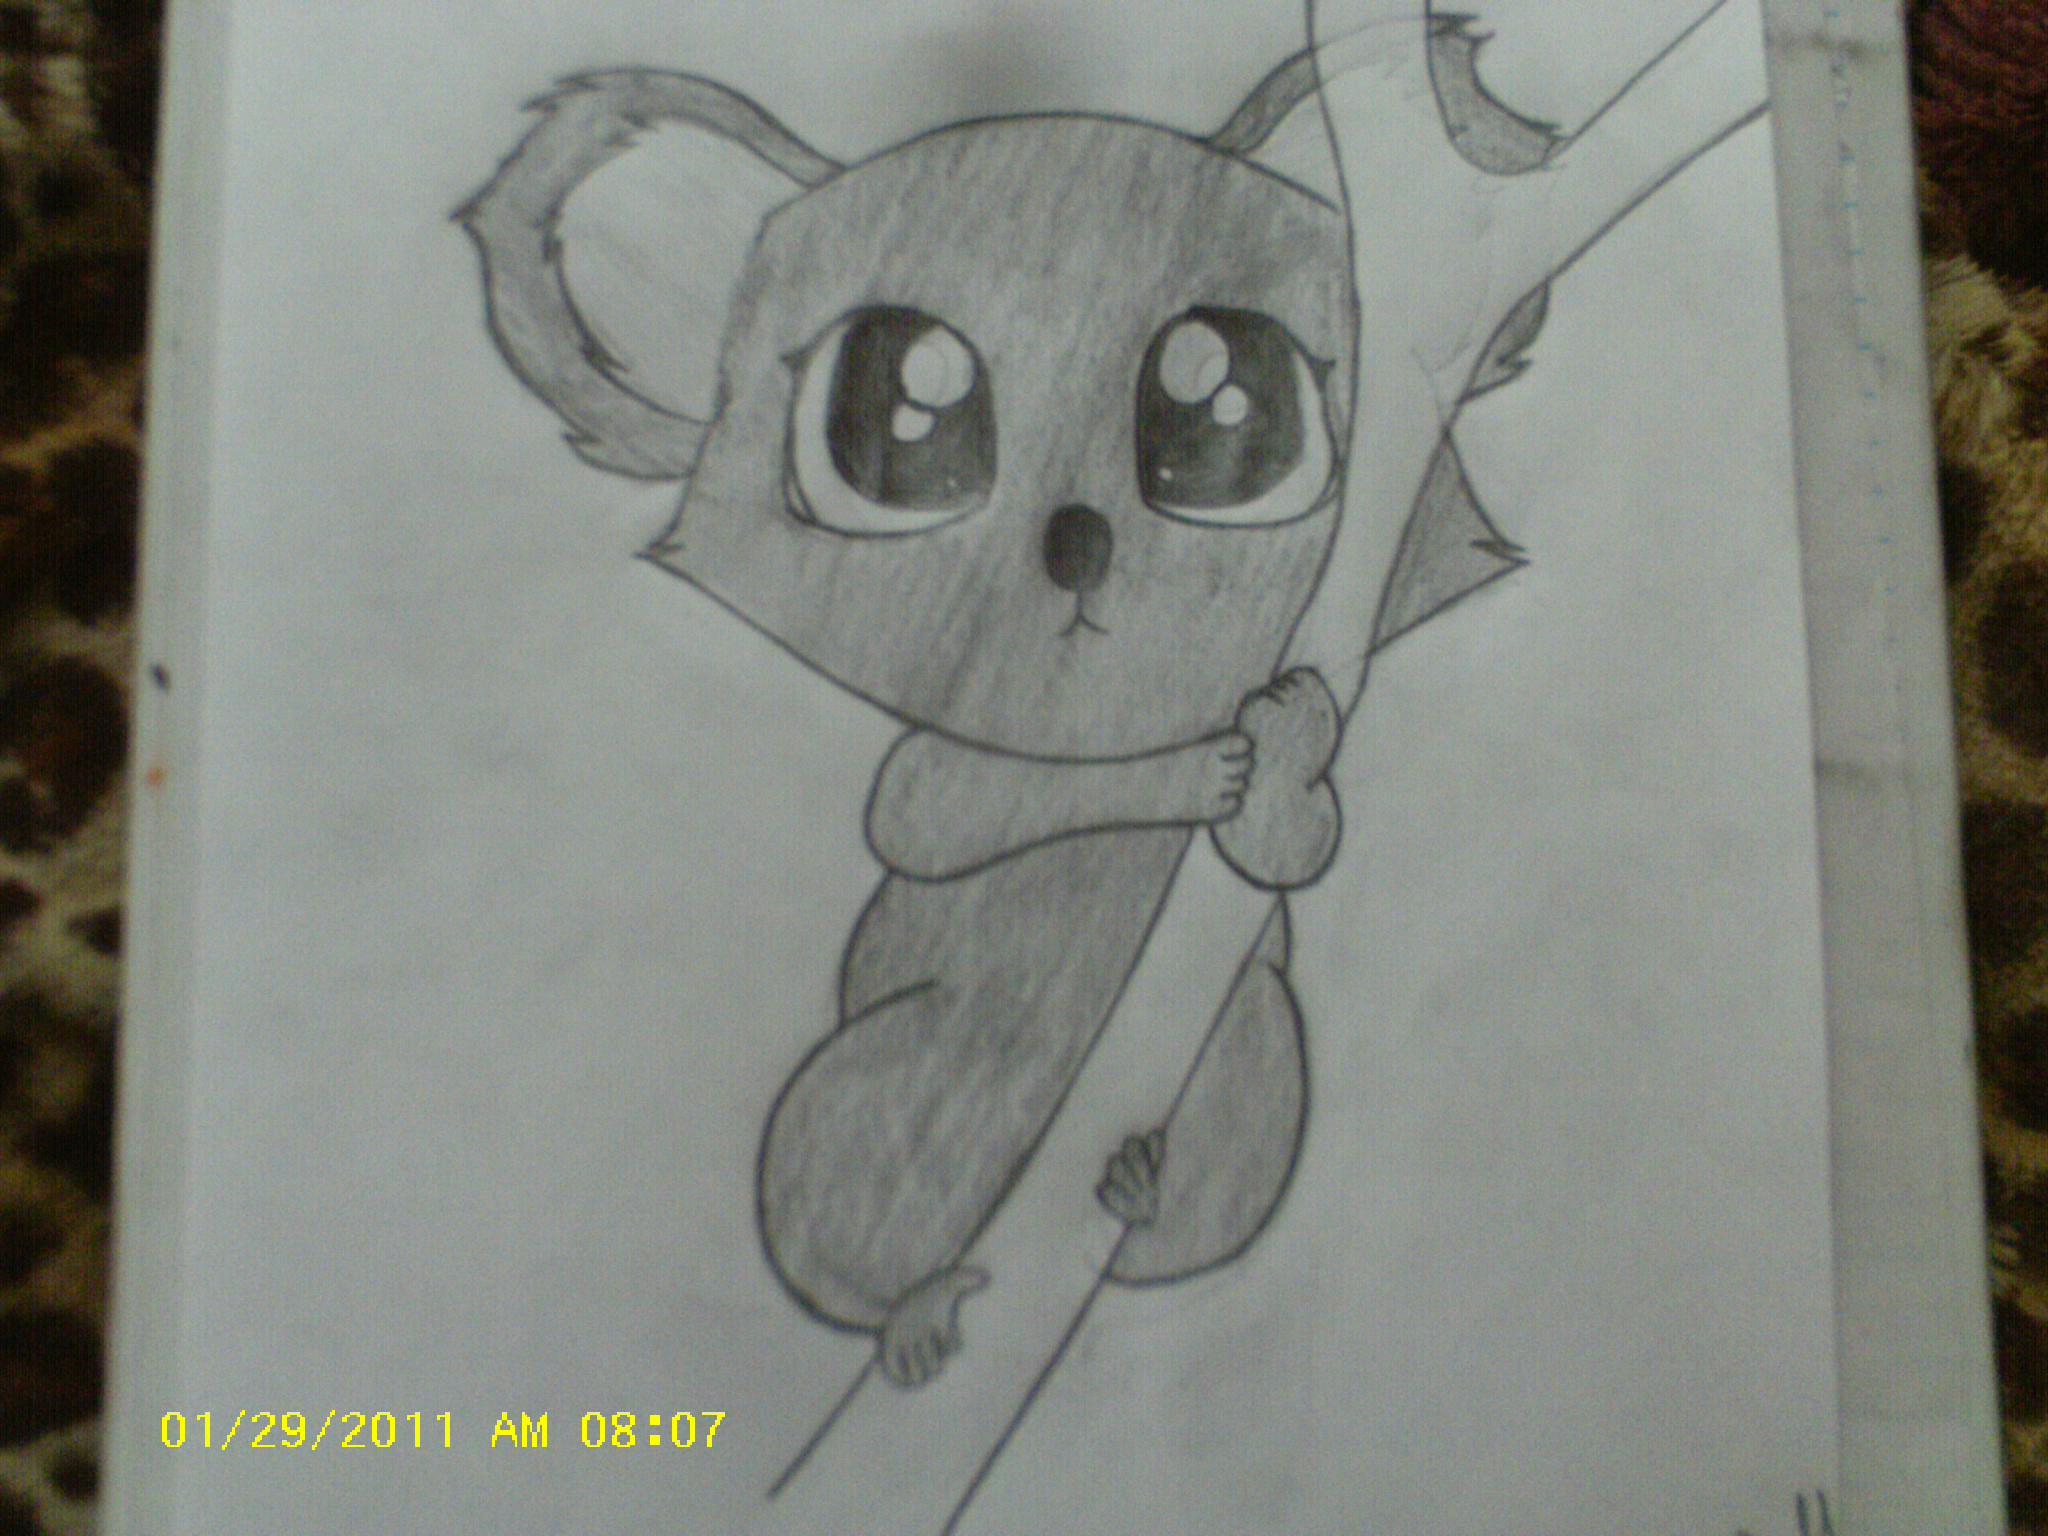 2048x1536 How To Draw A Cute Koala